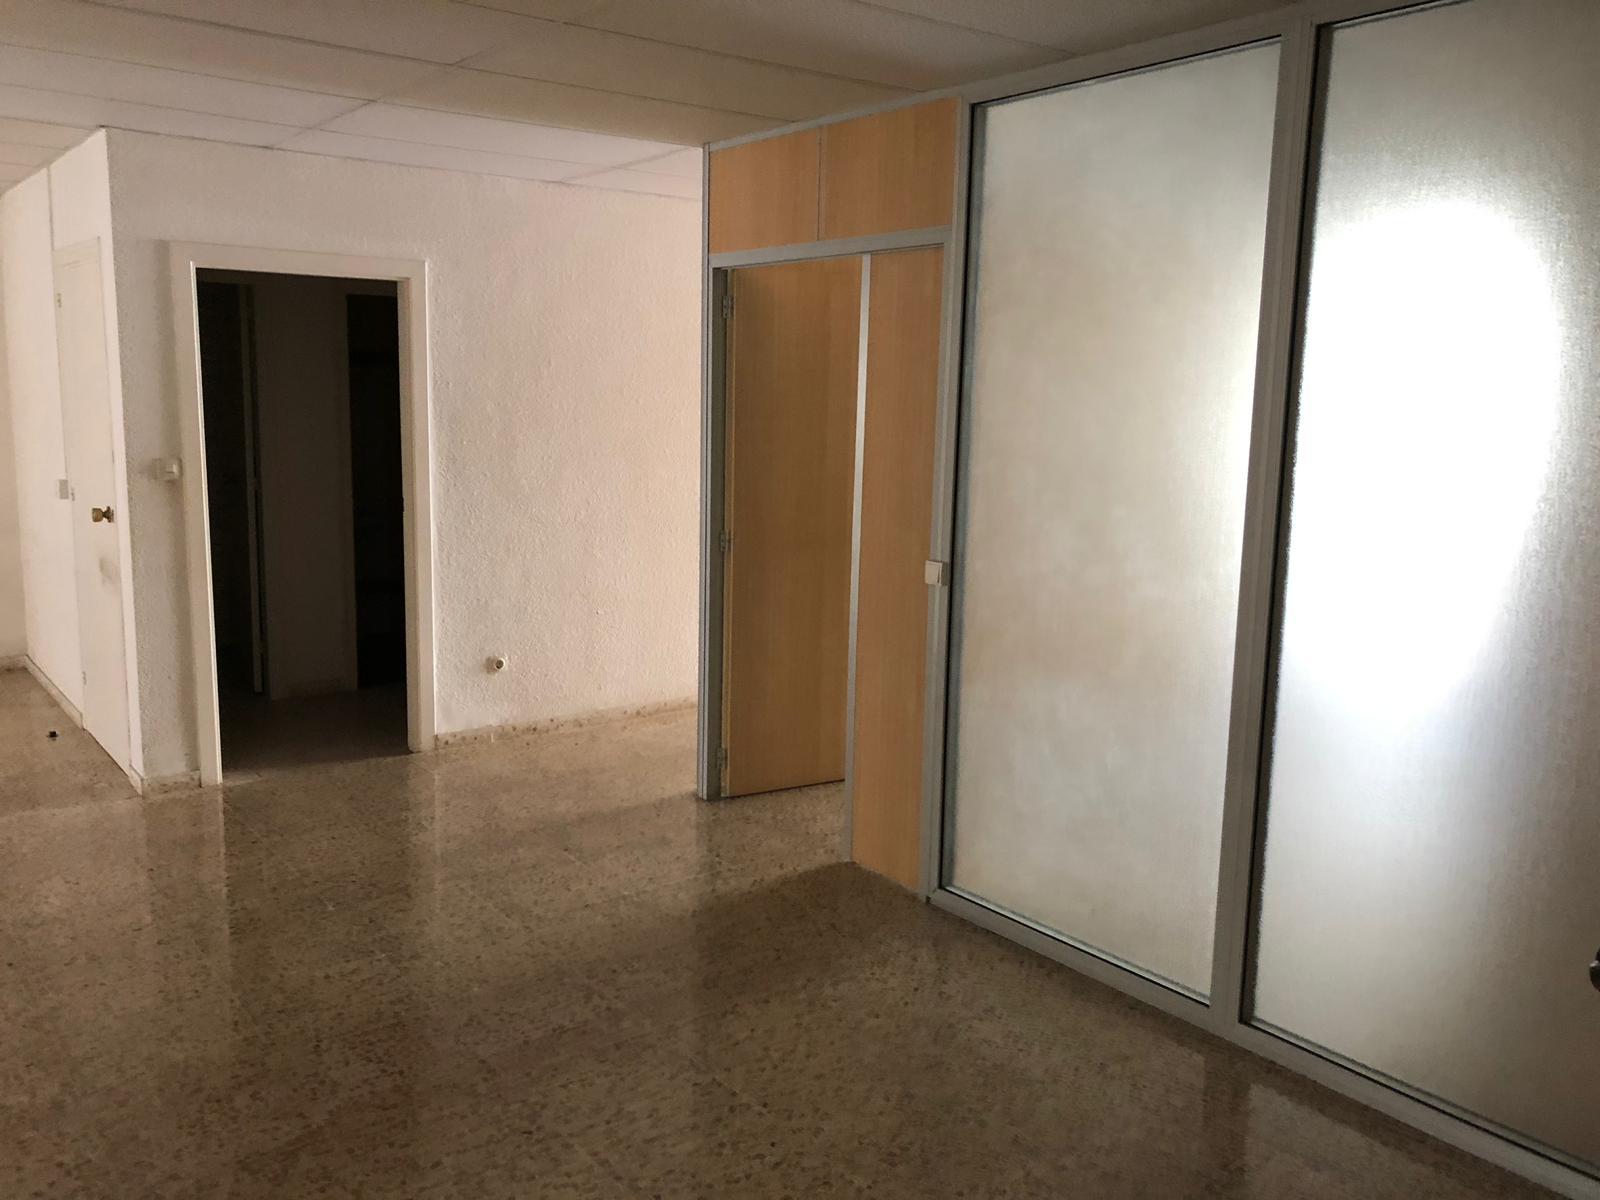 Local en venta en Torre Garrell, Vilanova I la Geltrú, Barcelona, Avenida Francesc Macia, 160.000 €, 147 m2